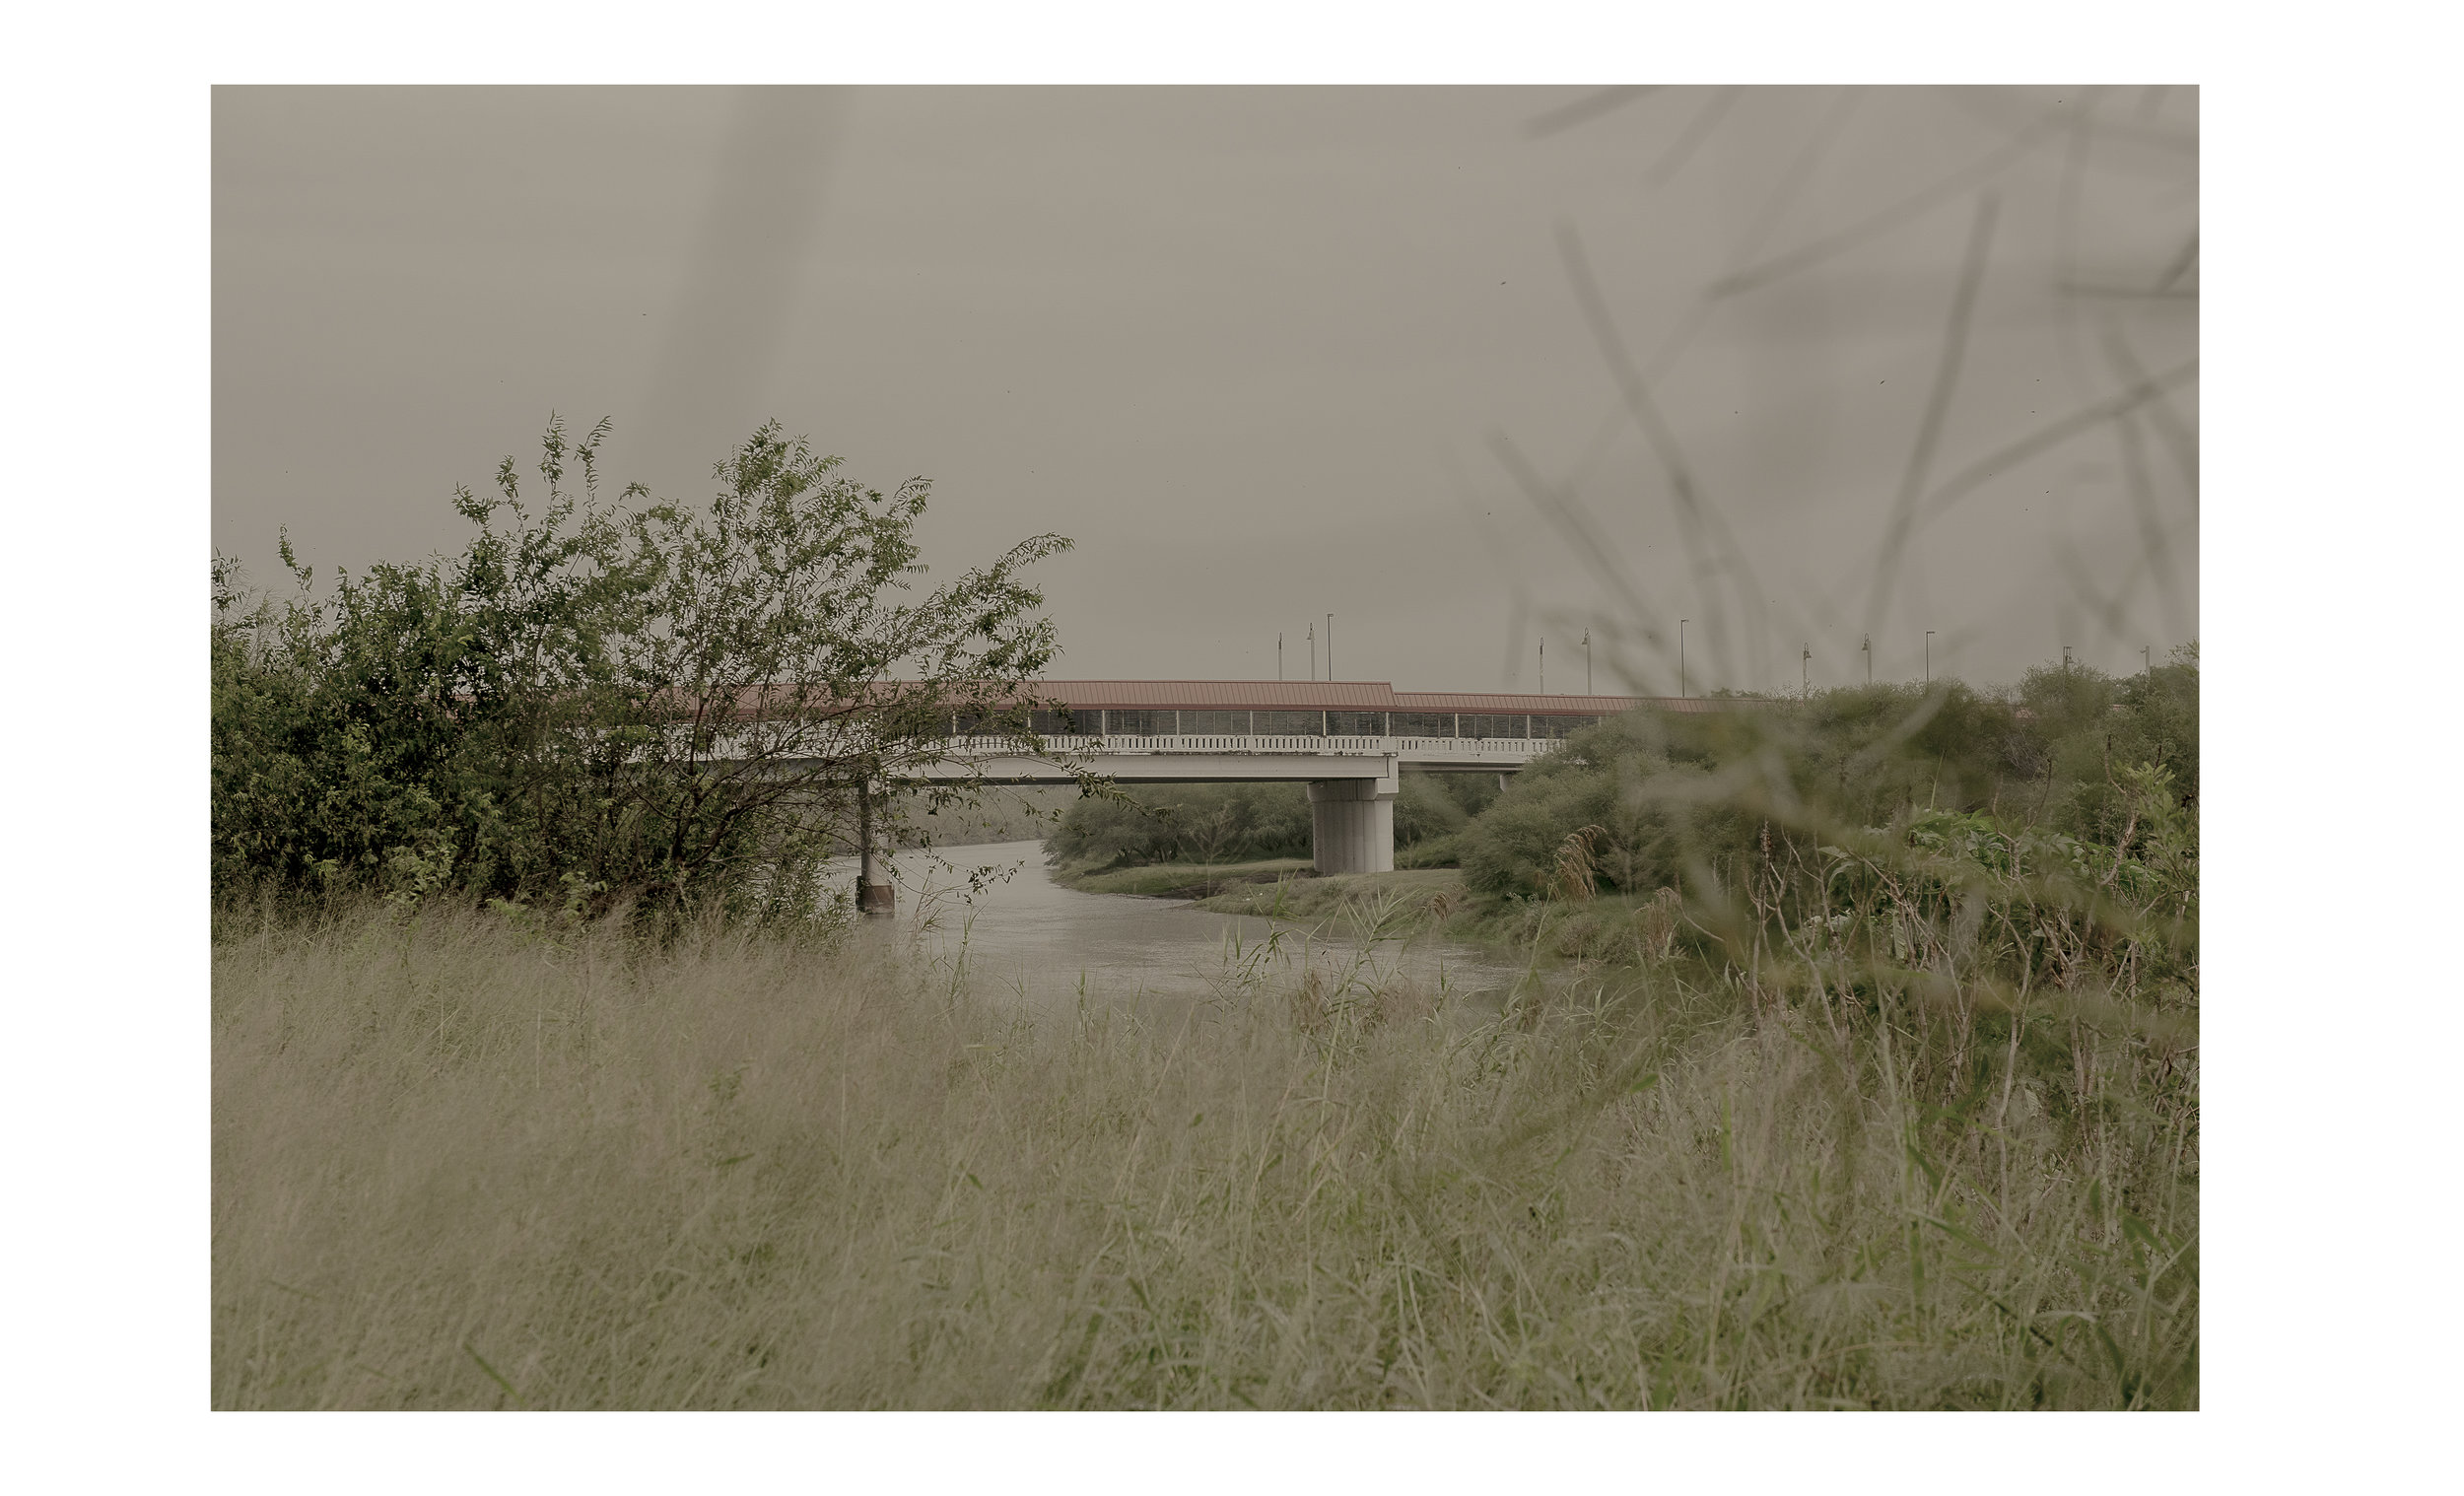 bridges8.jpg